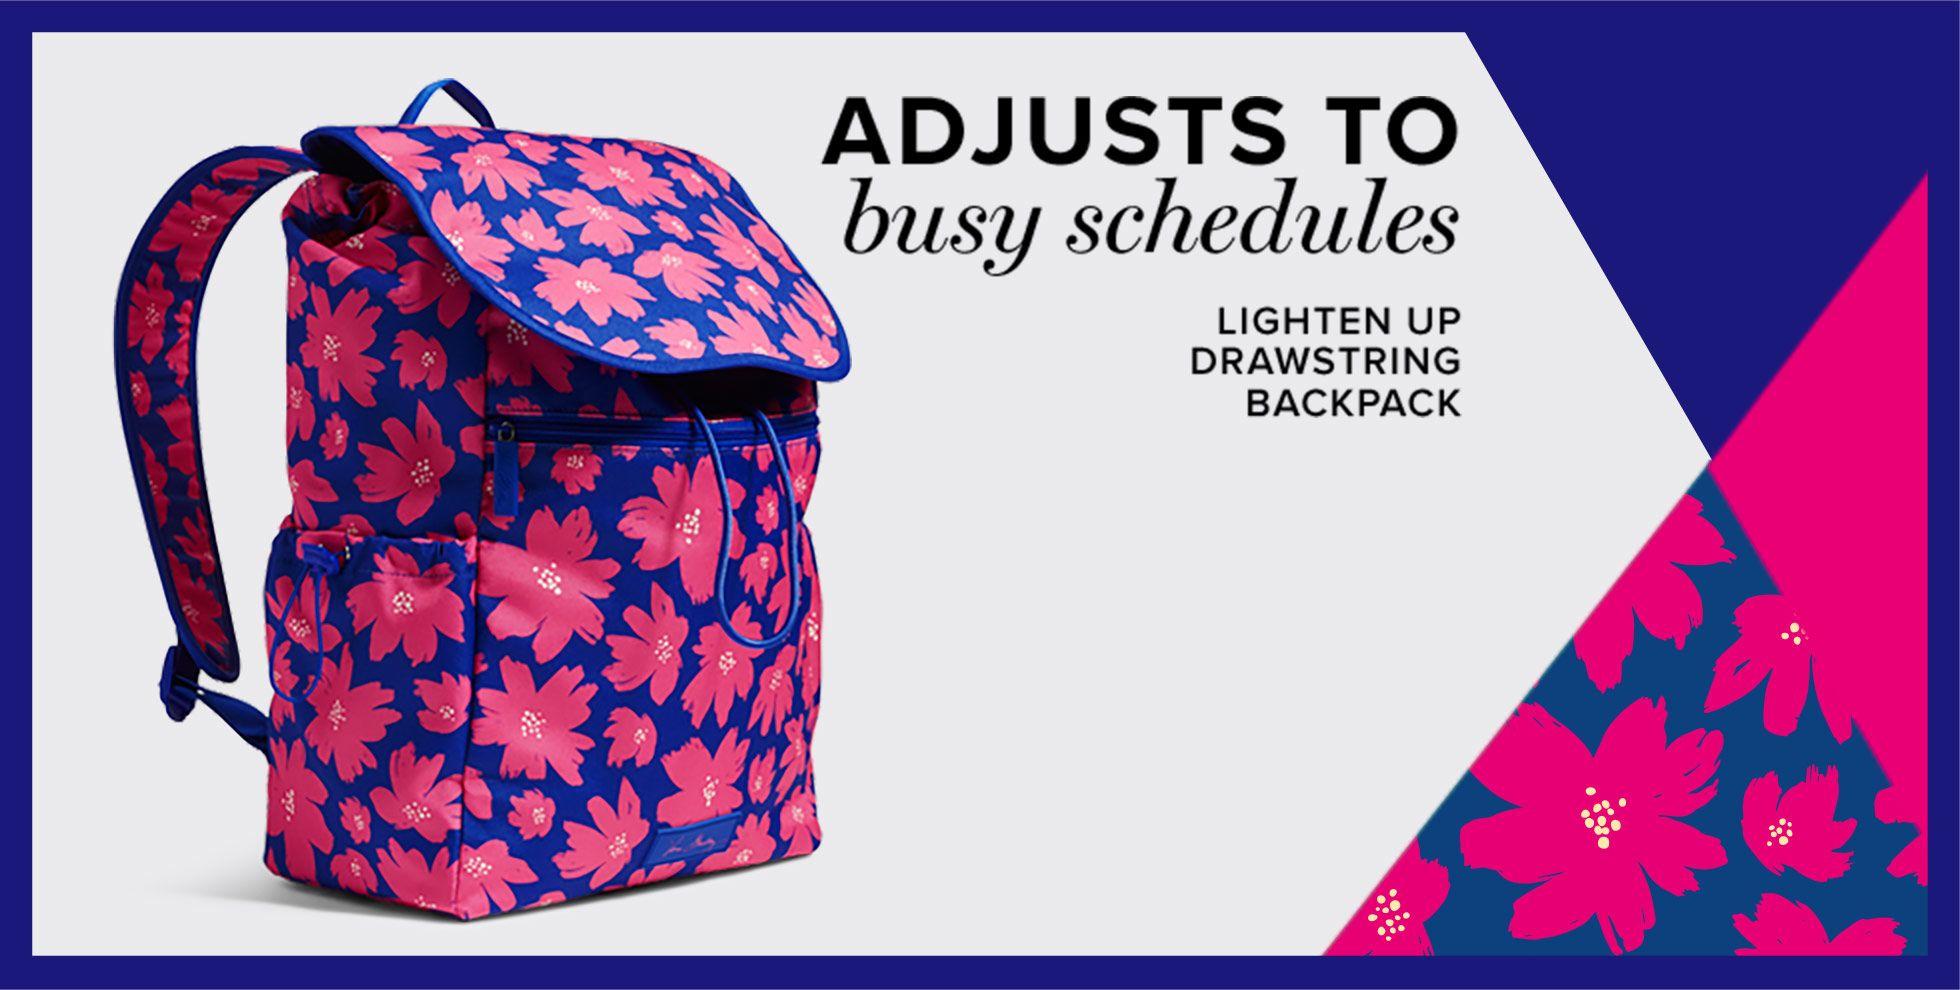 Lighten Up Drawstring Backpack